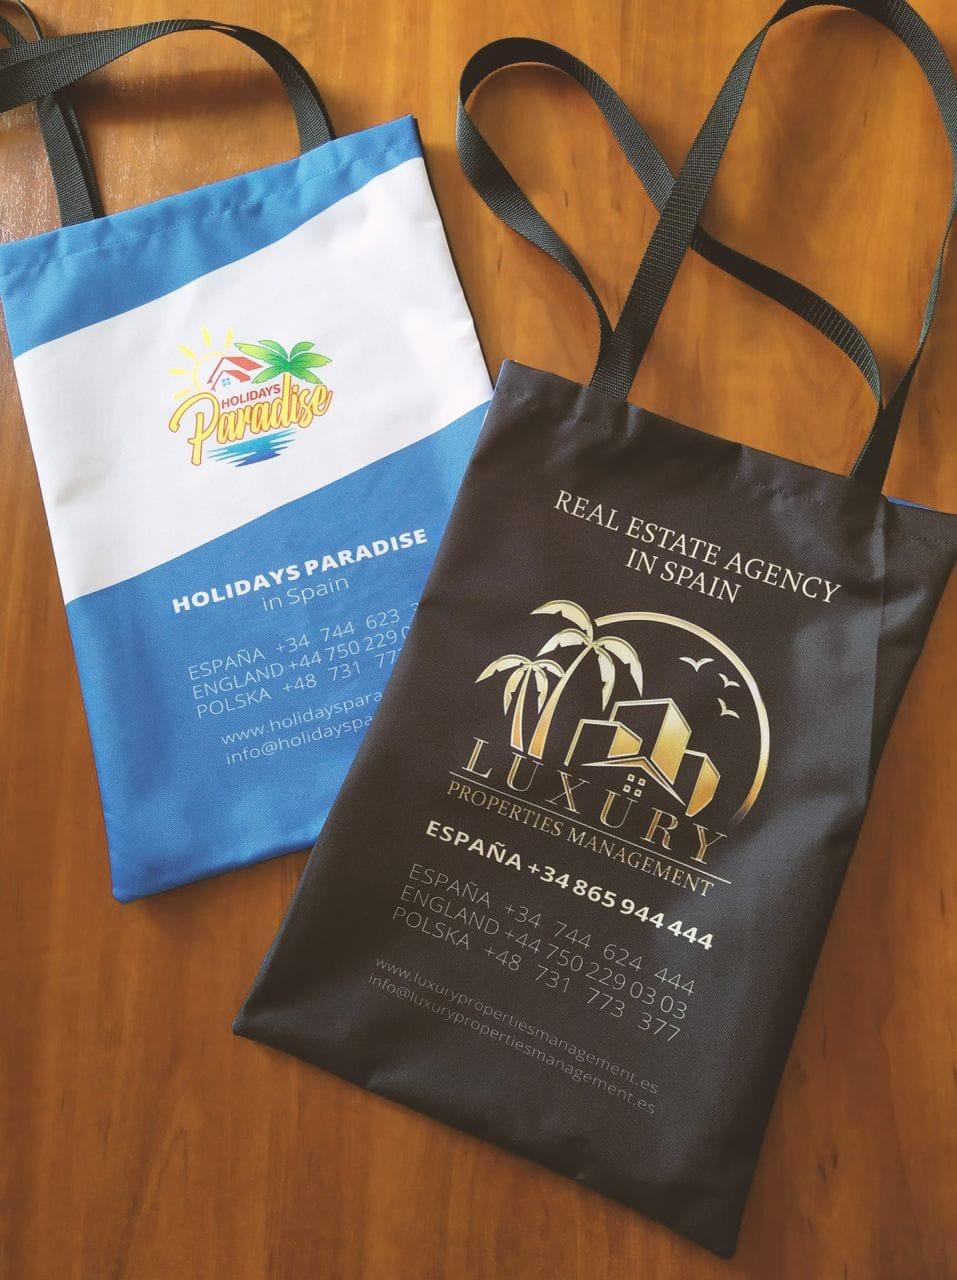 torby reklamowe z logo holiday paradise oraz luxuryproperties management